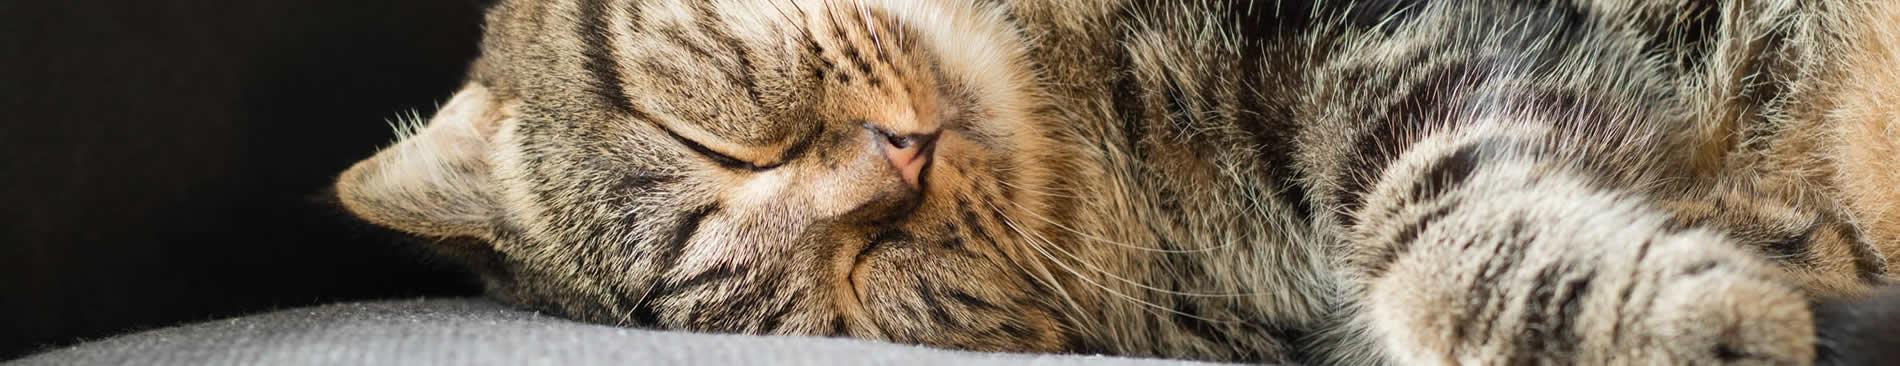 cat eyes shut on sofa